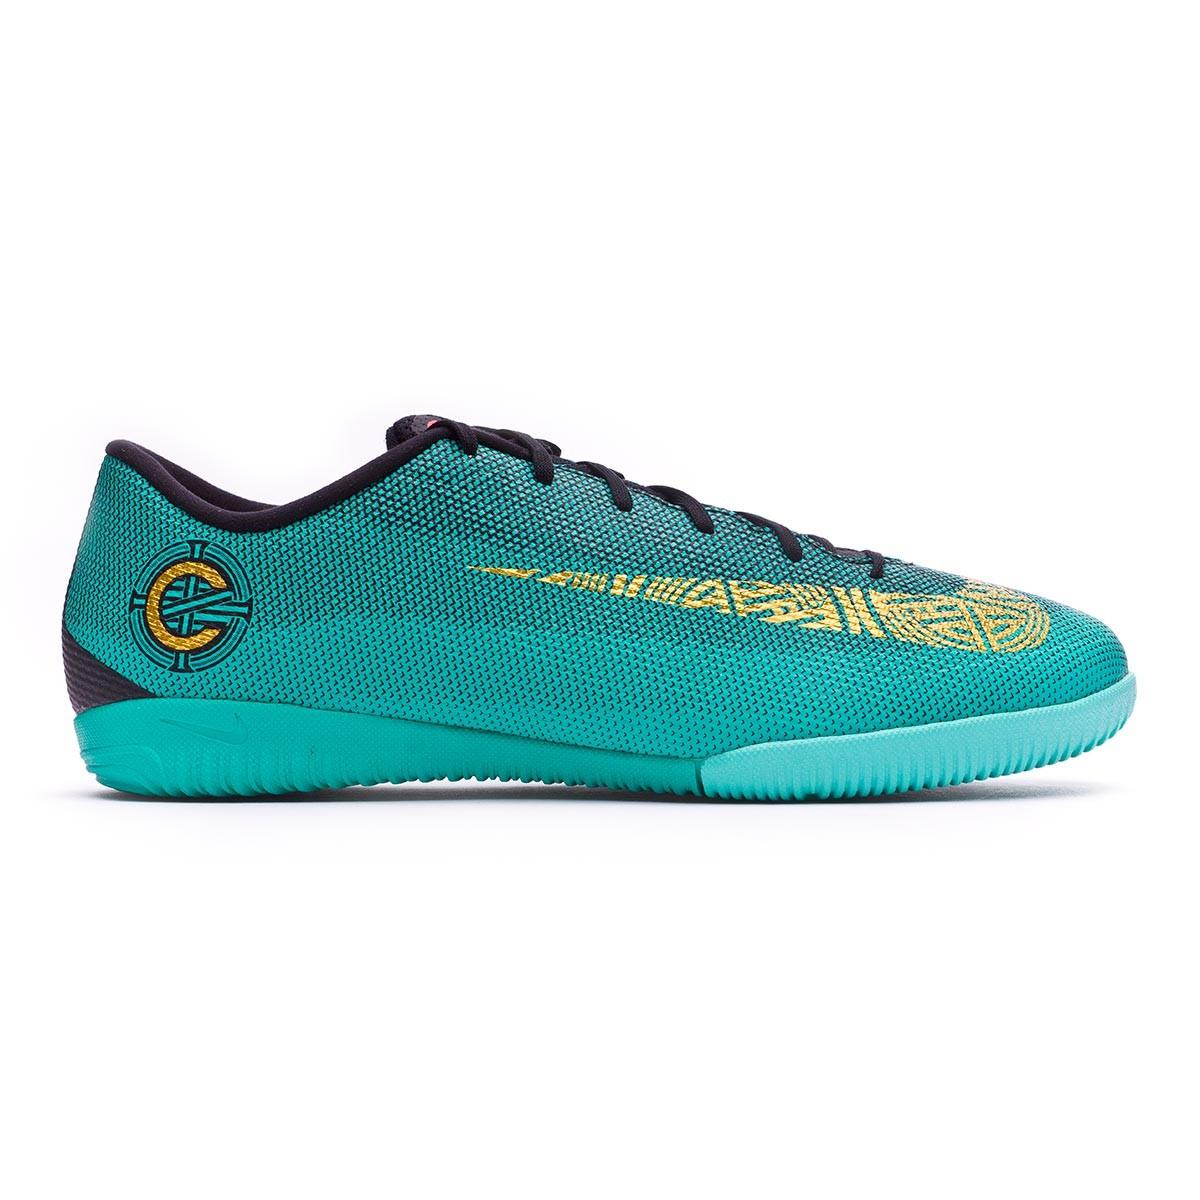 4338c08375b Futsal Boot Nike Mercurial VaporX XII Academy CR7 IC Clear jade-Metallic  vivid gold-Black - Football store Fútbol Emotion